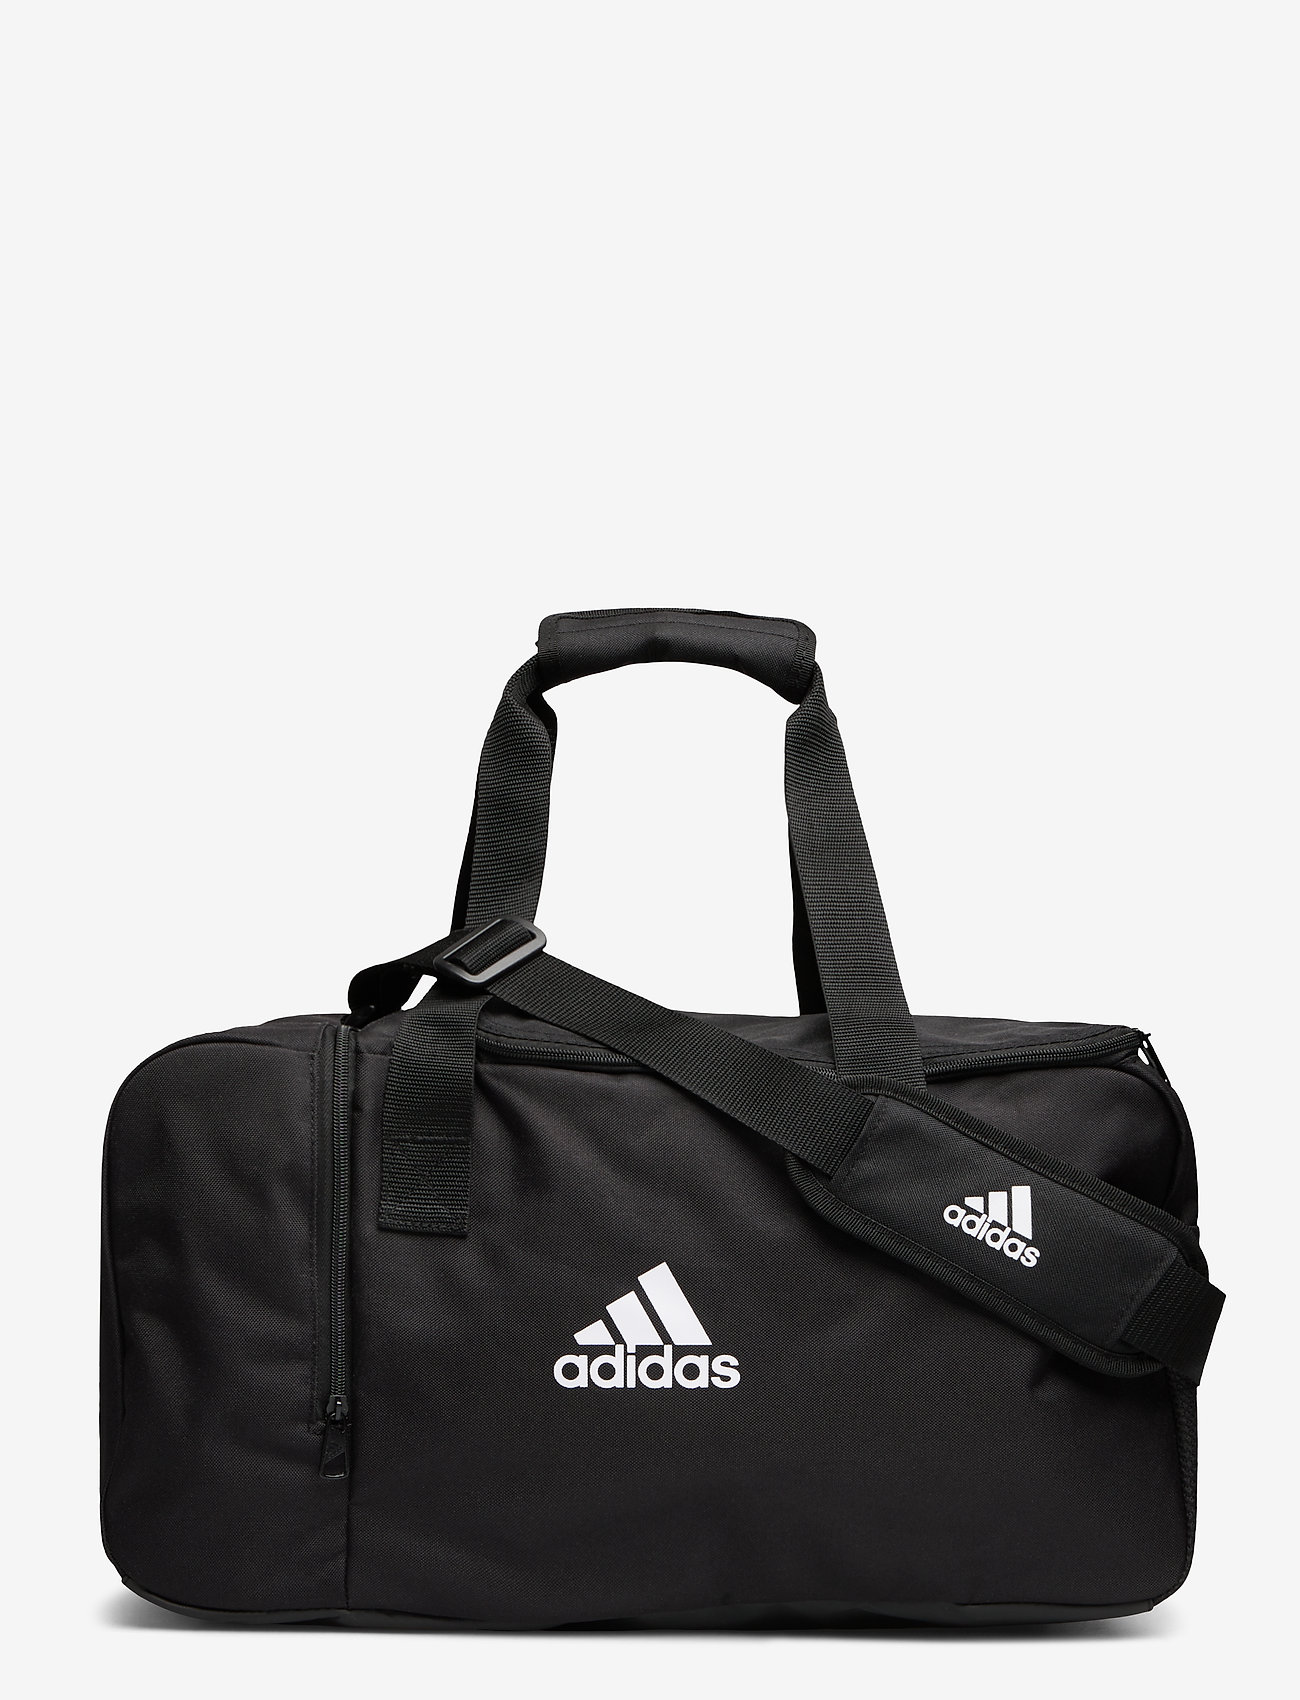 adidas Performance - TIRO DU S - torby sportowe - black/white - 0